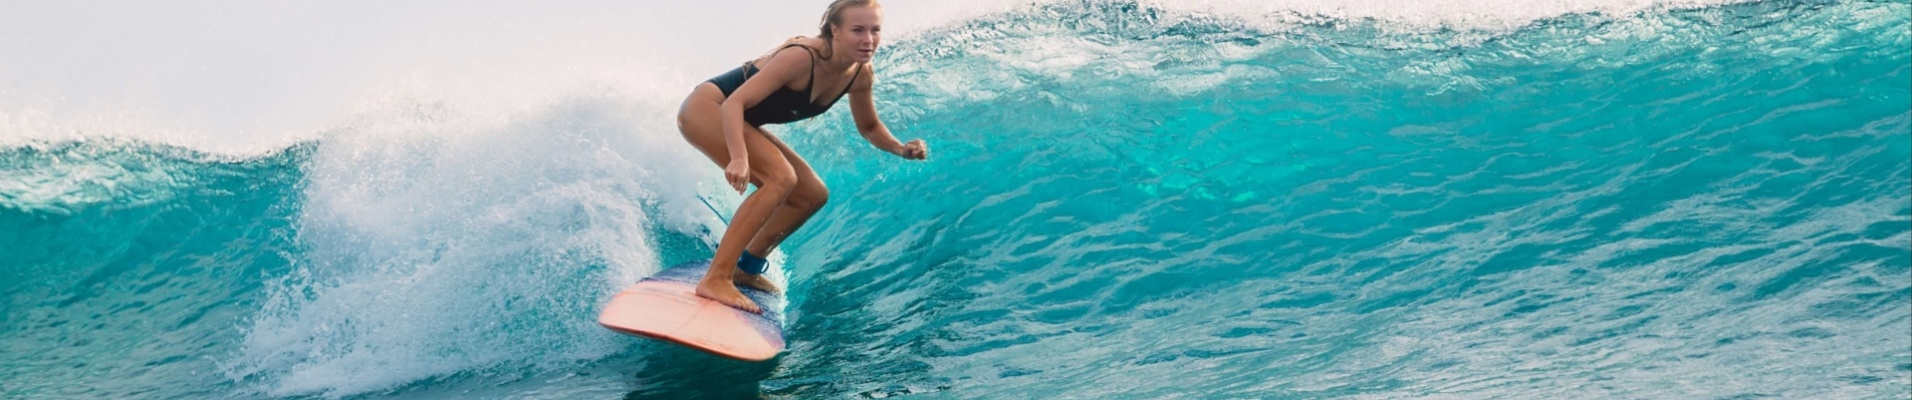 surfeuse-chili